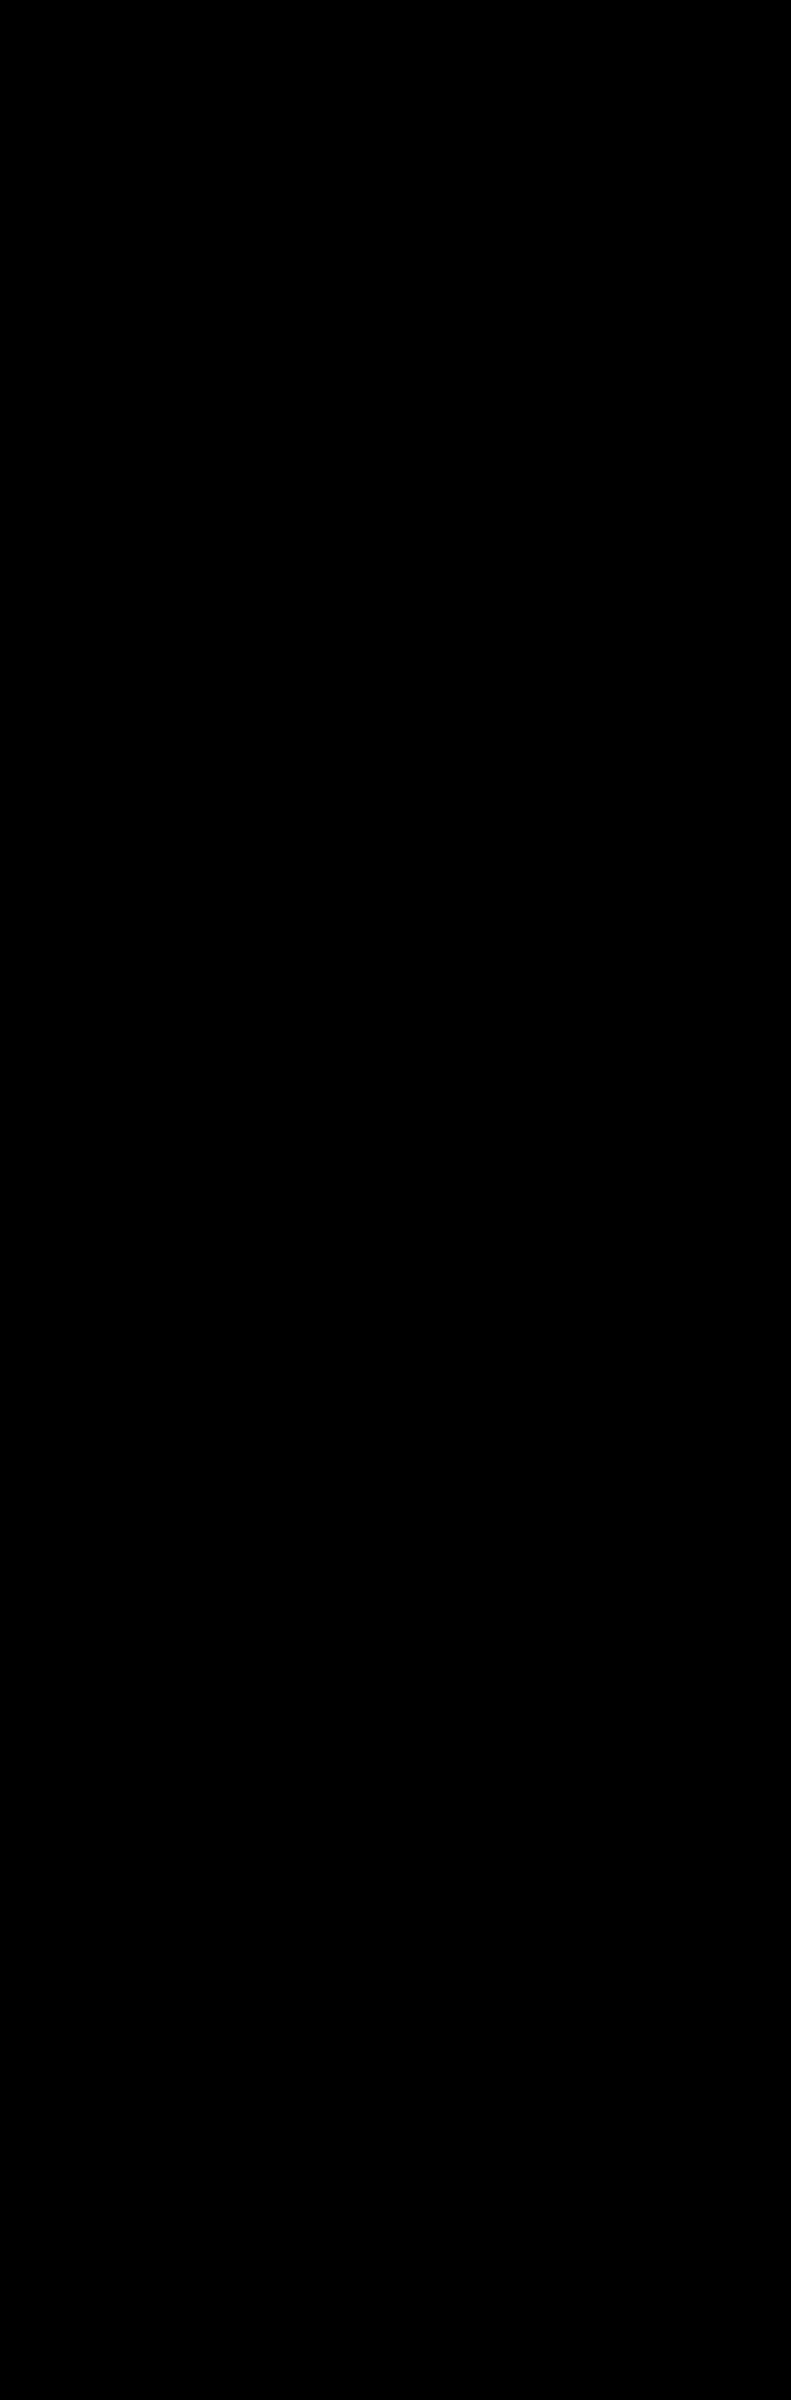 791x2400 Clipart